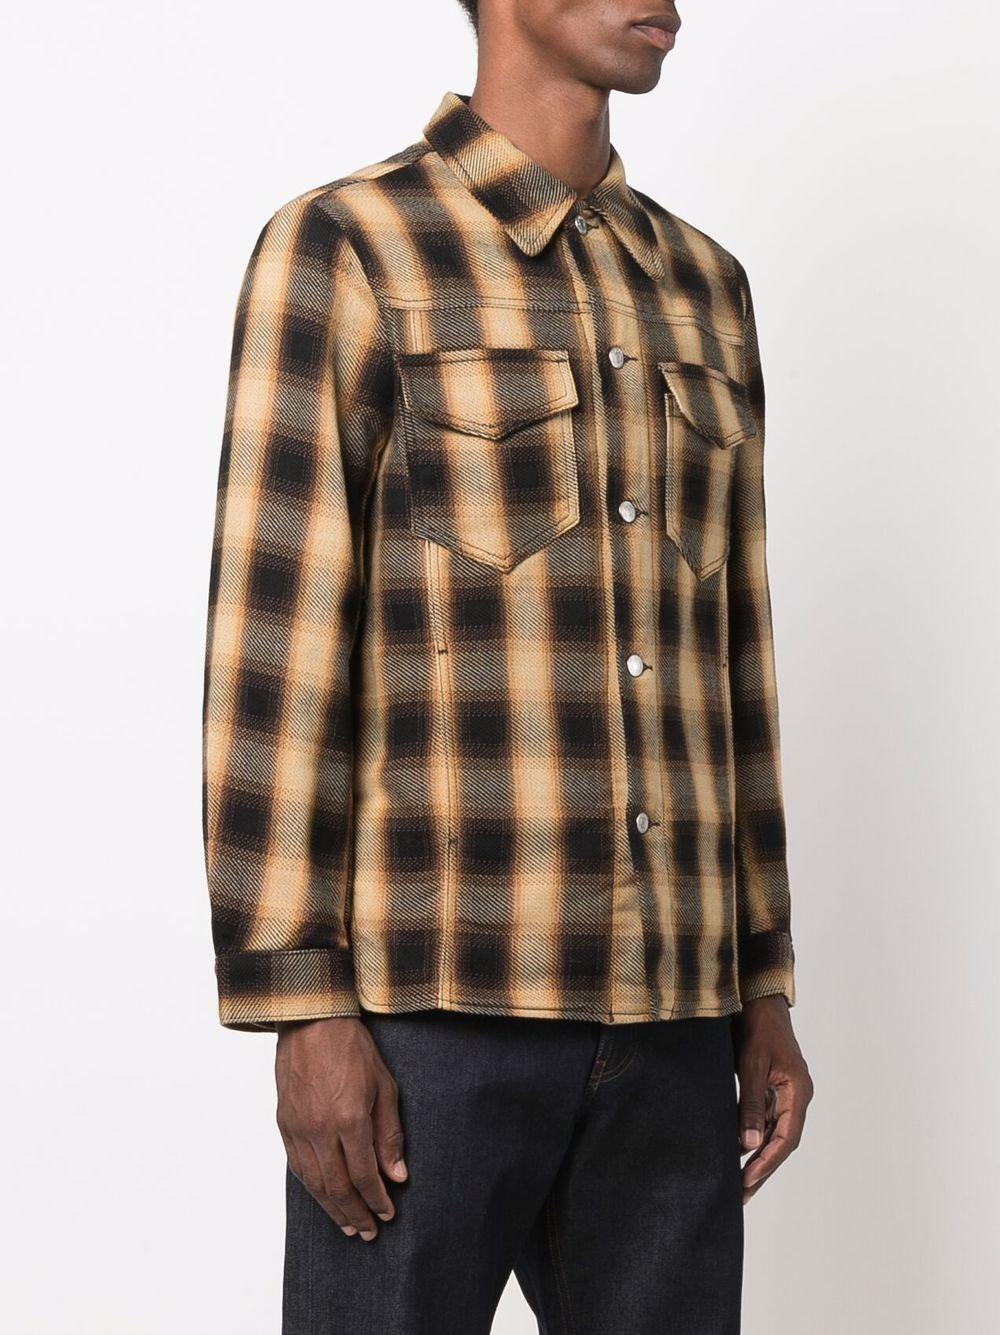 valash jacket man black in cotton DRIES VAN NOTEN | Jackets | VALASH 3238102